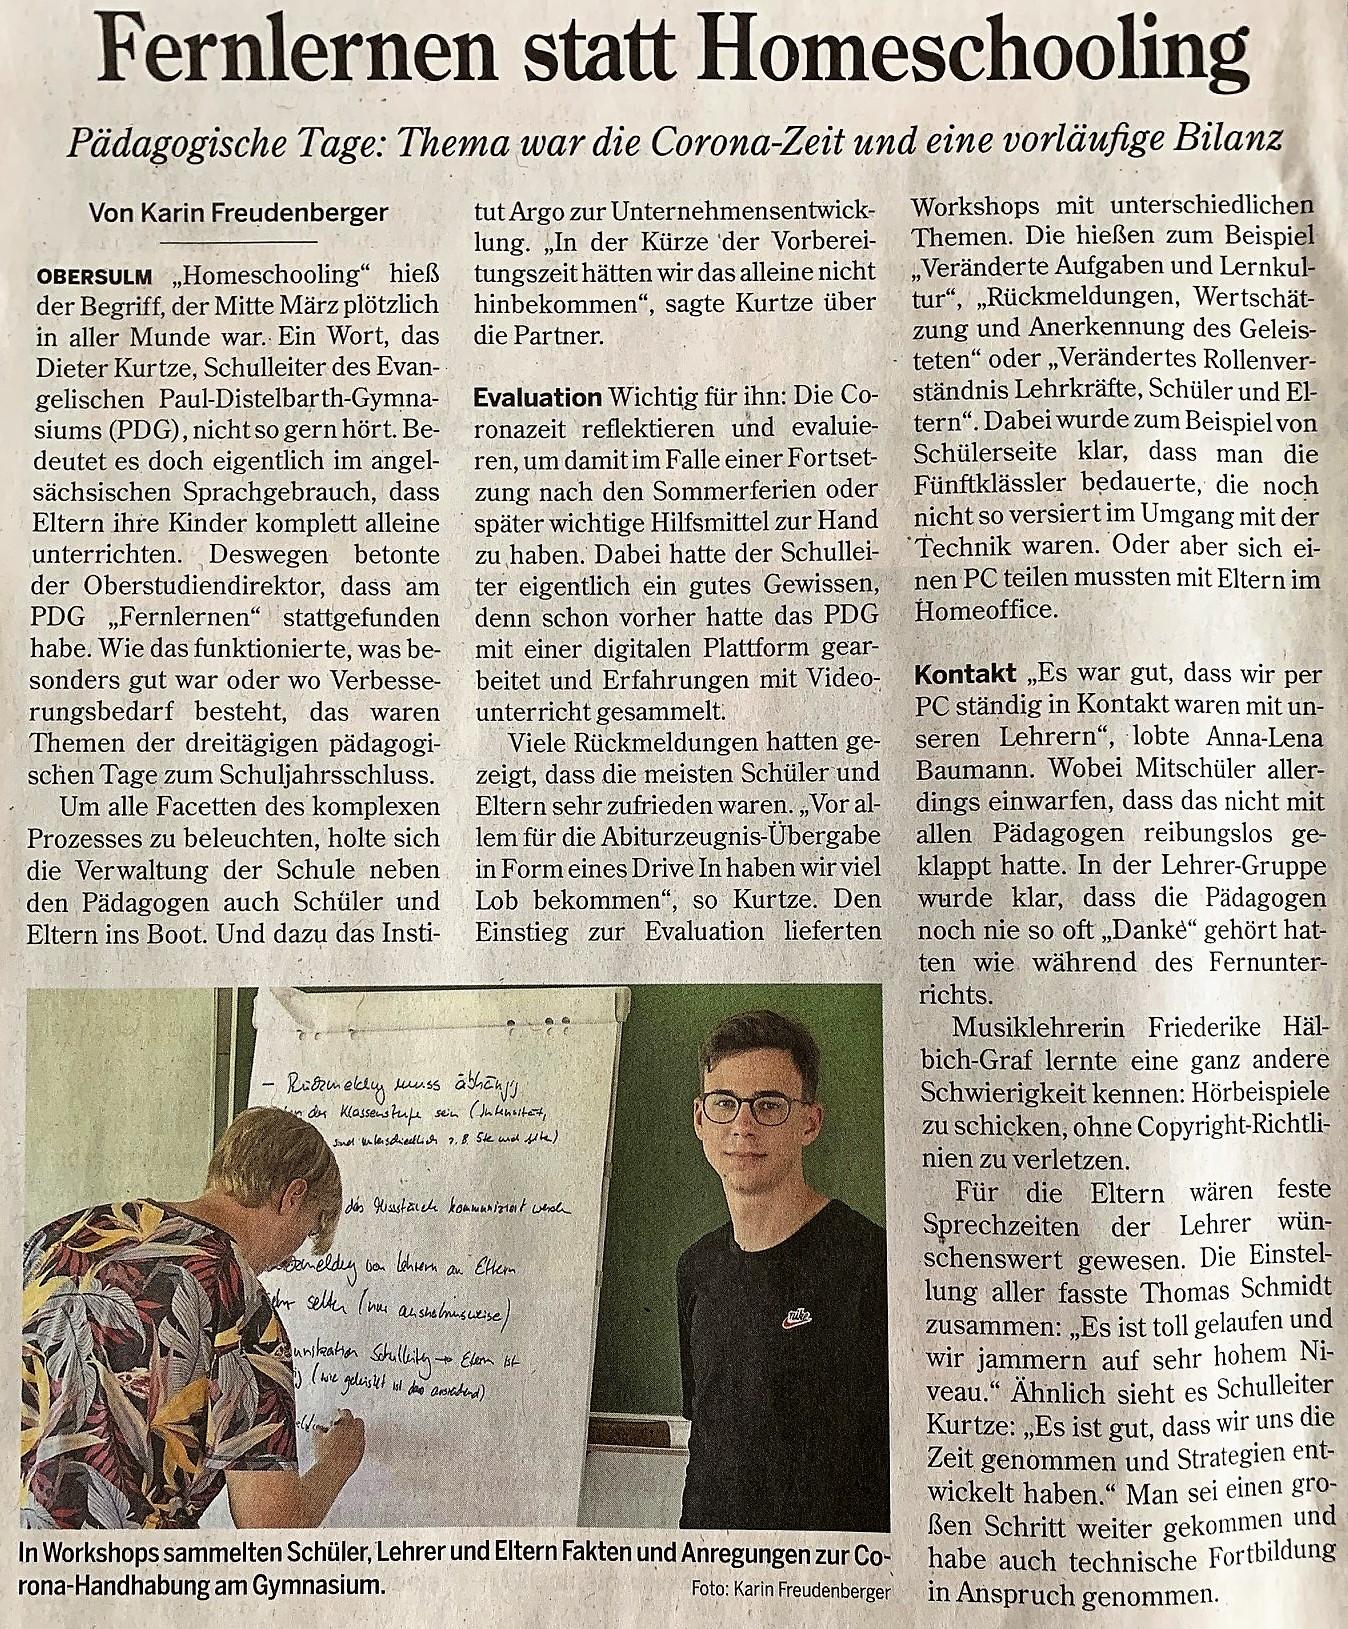 fernlernen-statt-homeschooling-am-ev-pdg-obersulm-2020